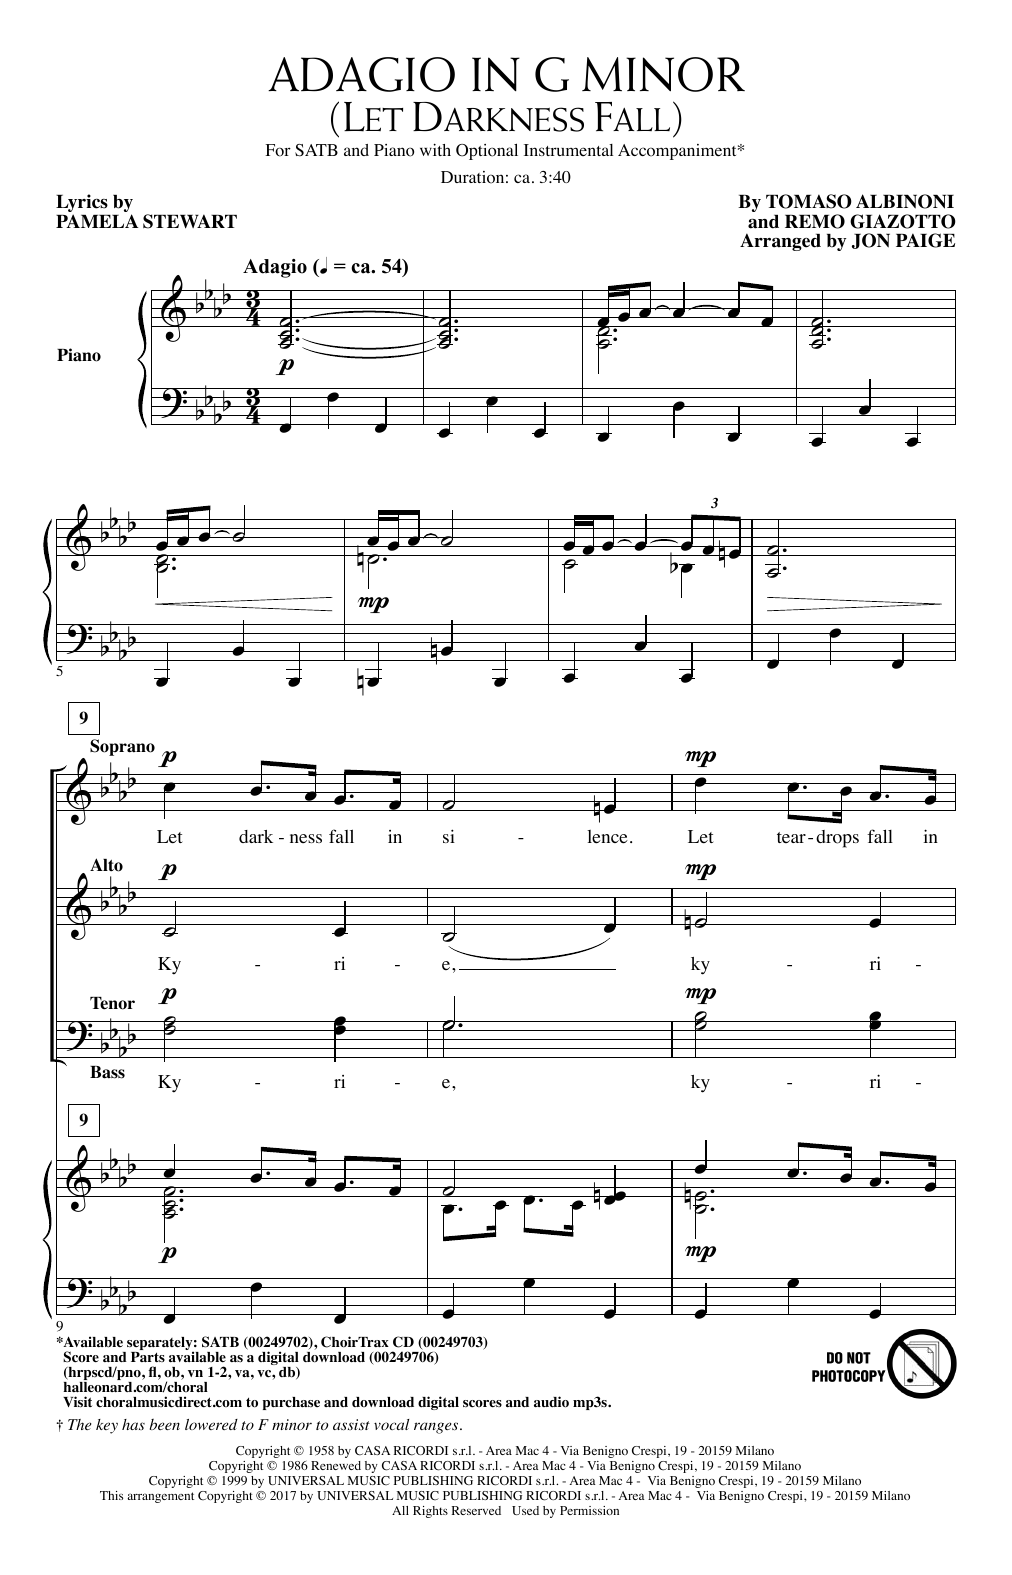 Adagio In Sol Minore (adagio In G Minor) Choral Satb Sheet